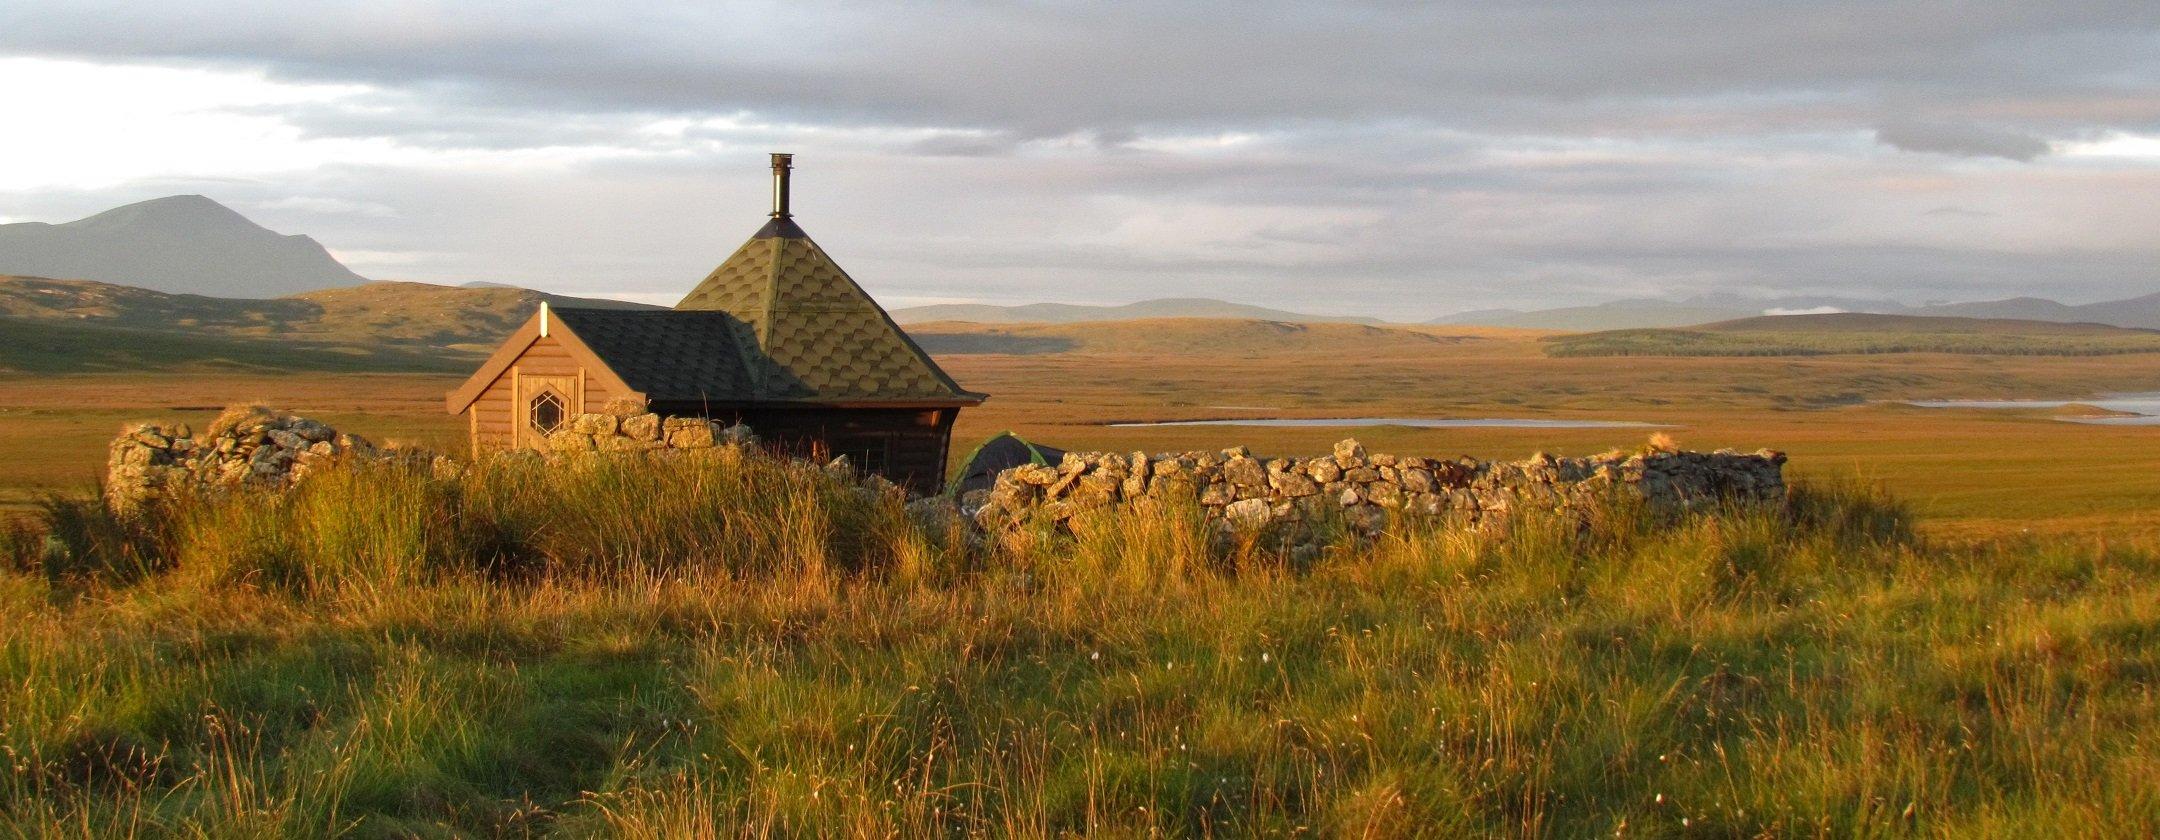 Cabin on Moor